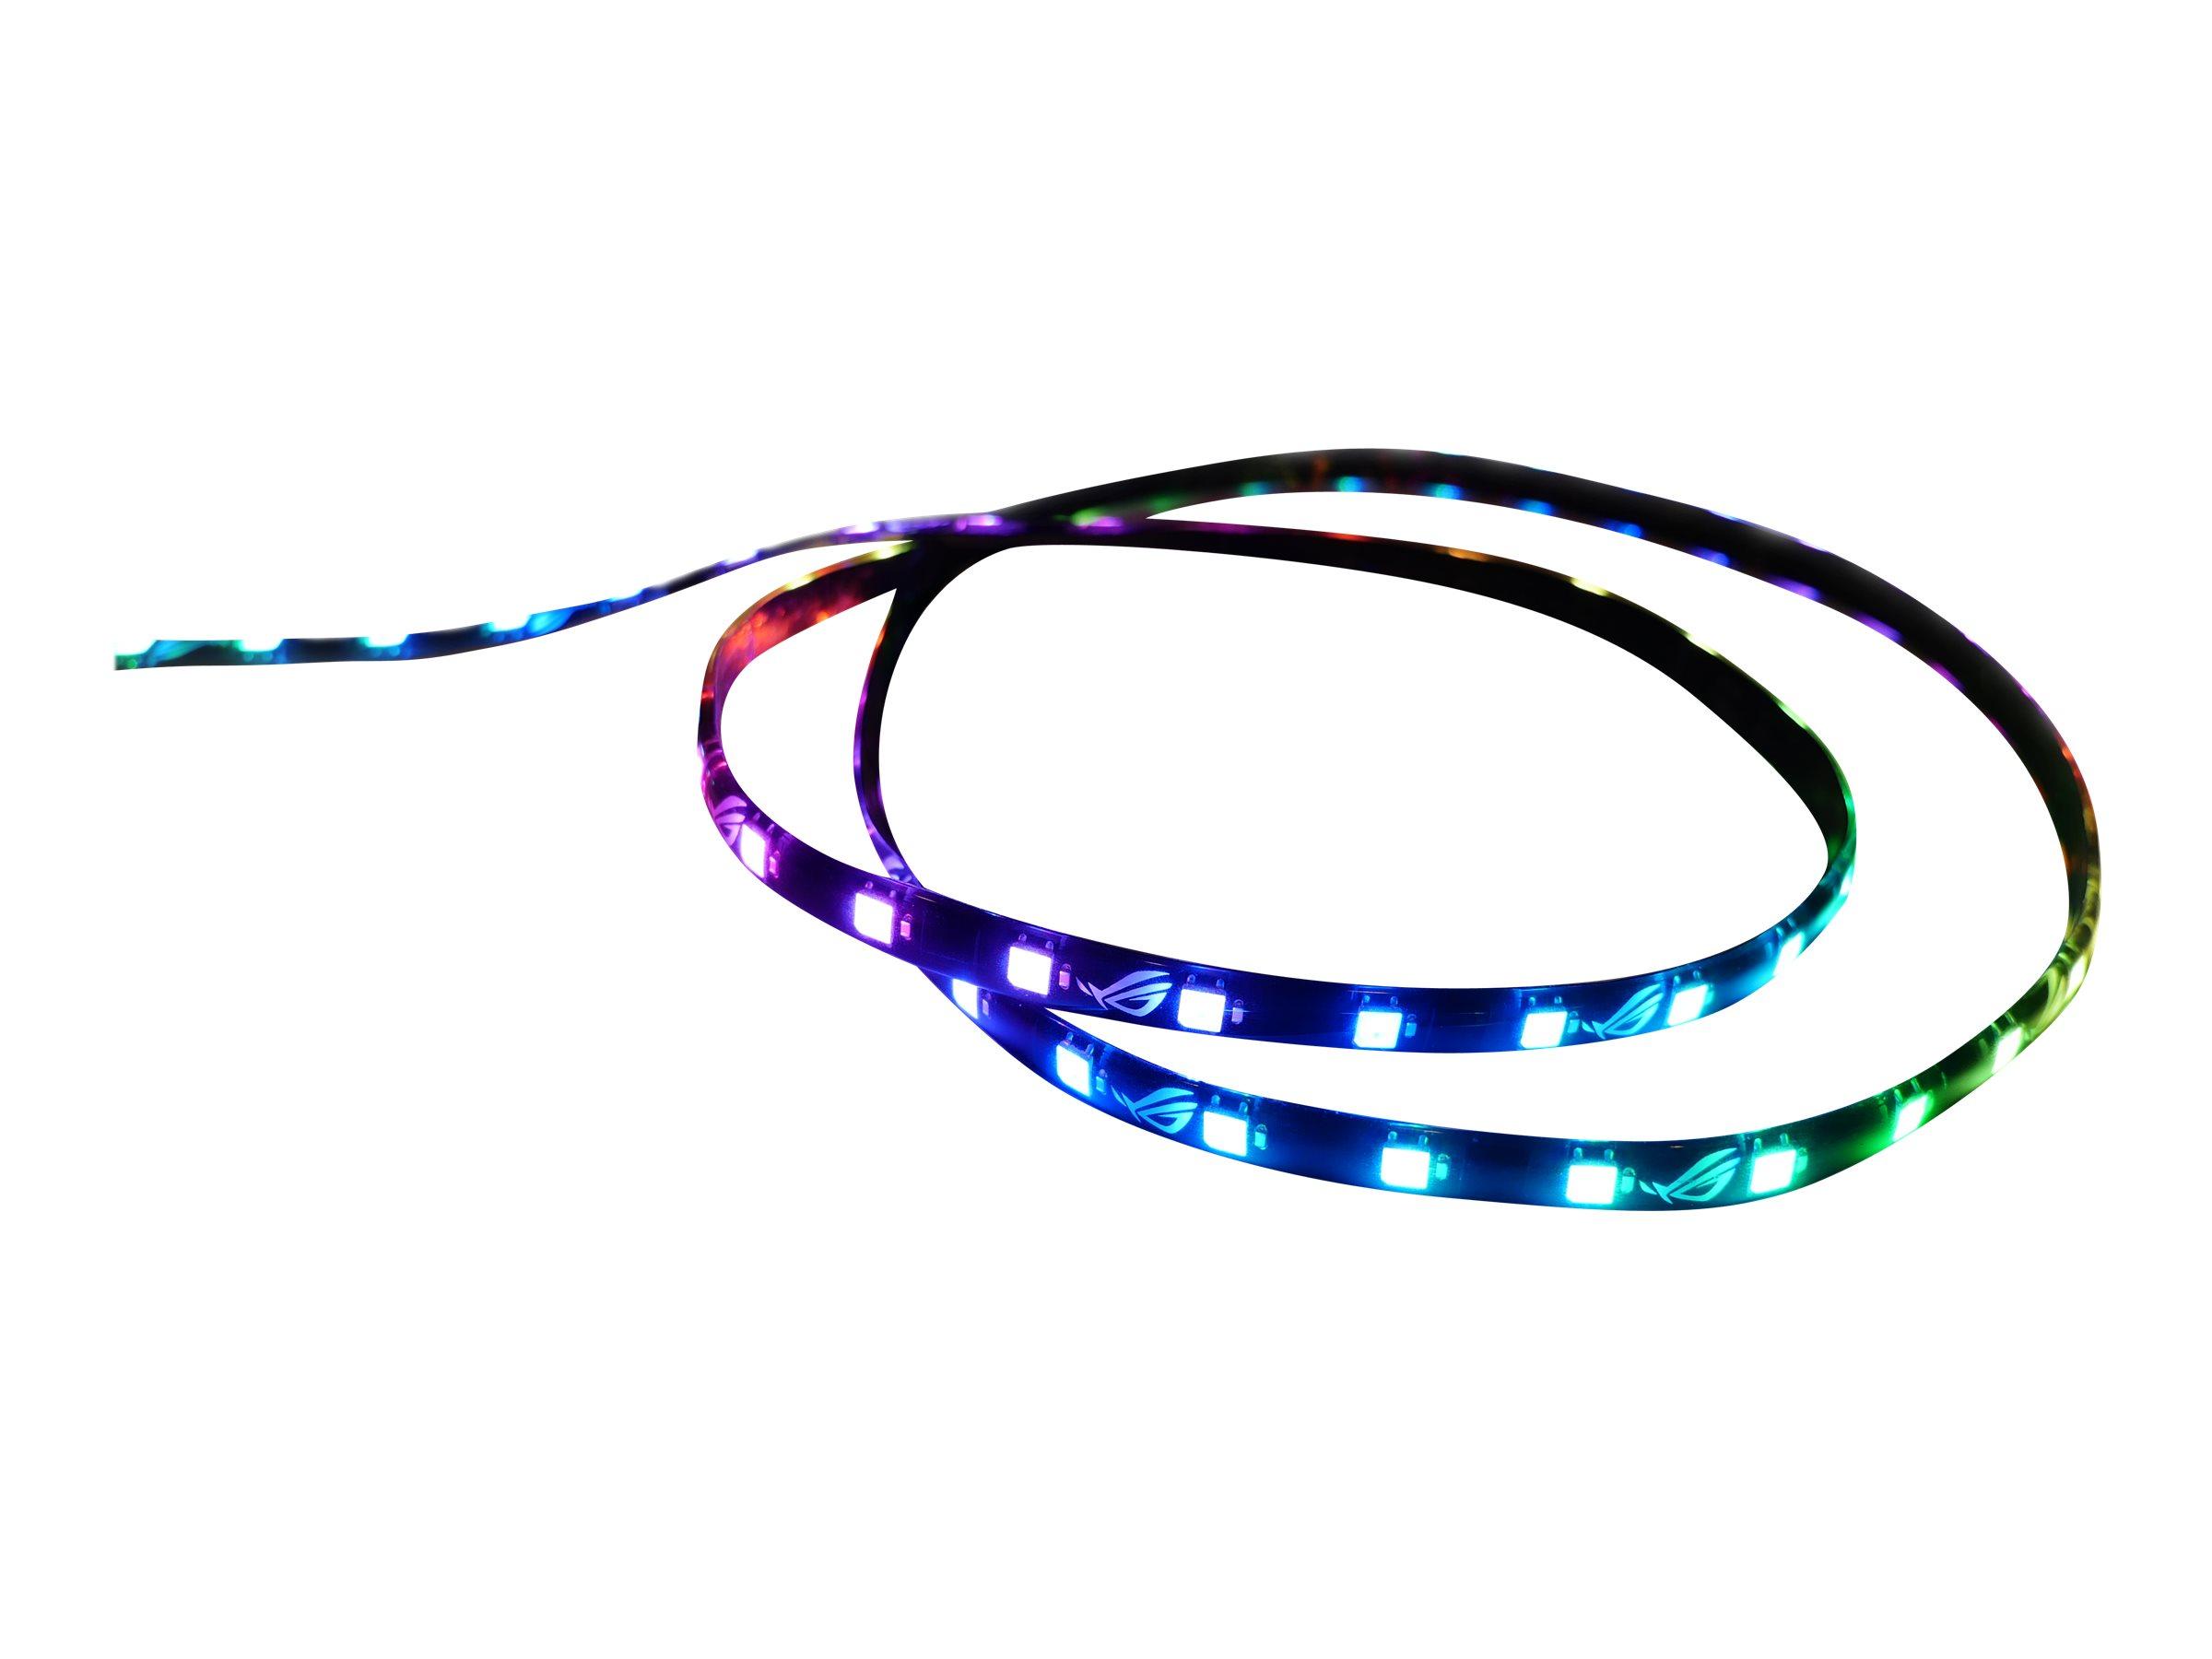 ASUS ROG Addressable LED Strip - Systemgehäusebeleuchtung (LED)